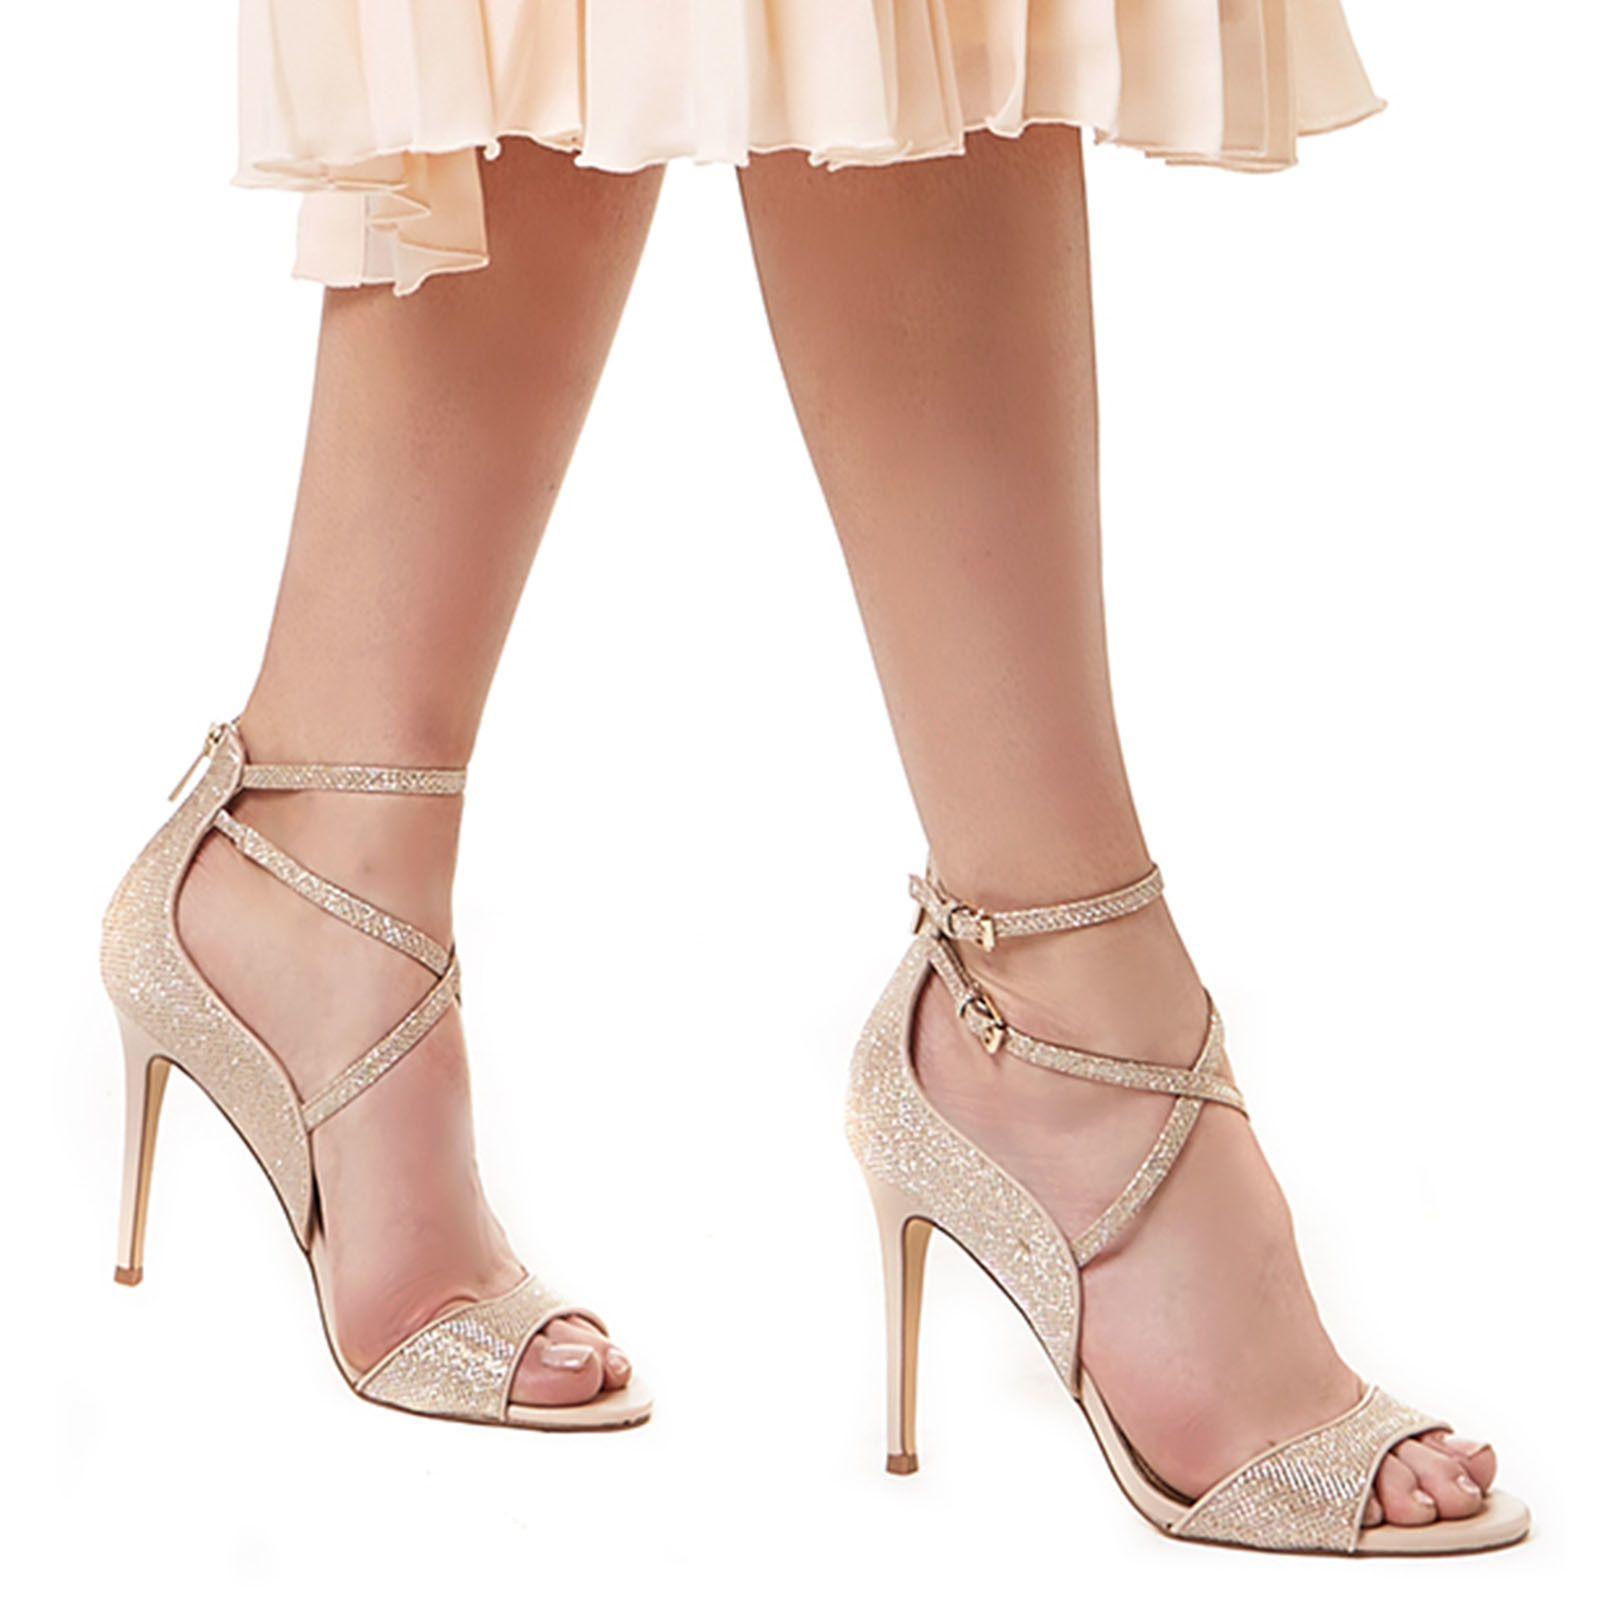 **High Heel Sandals by Miss KG - Heels - Shoes - Topshop